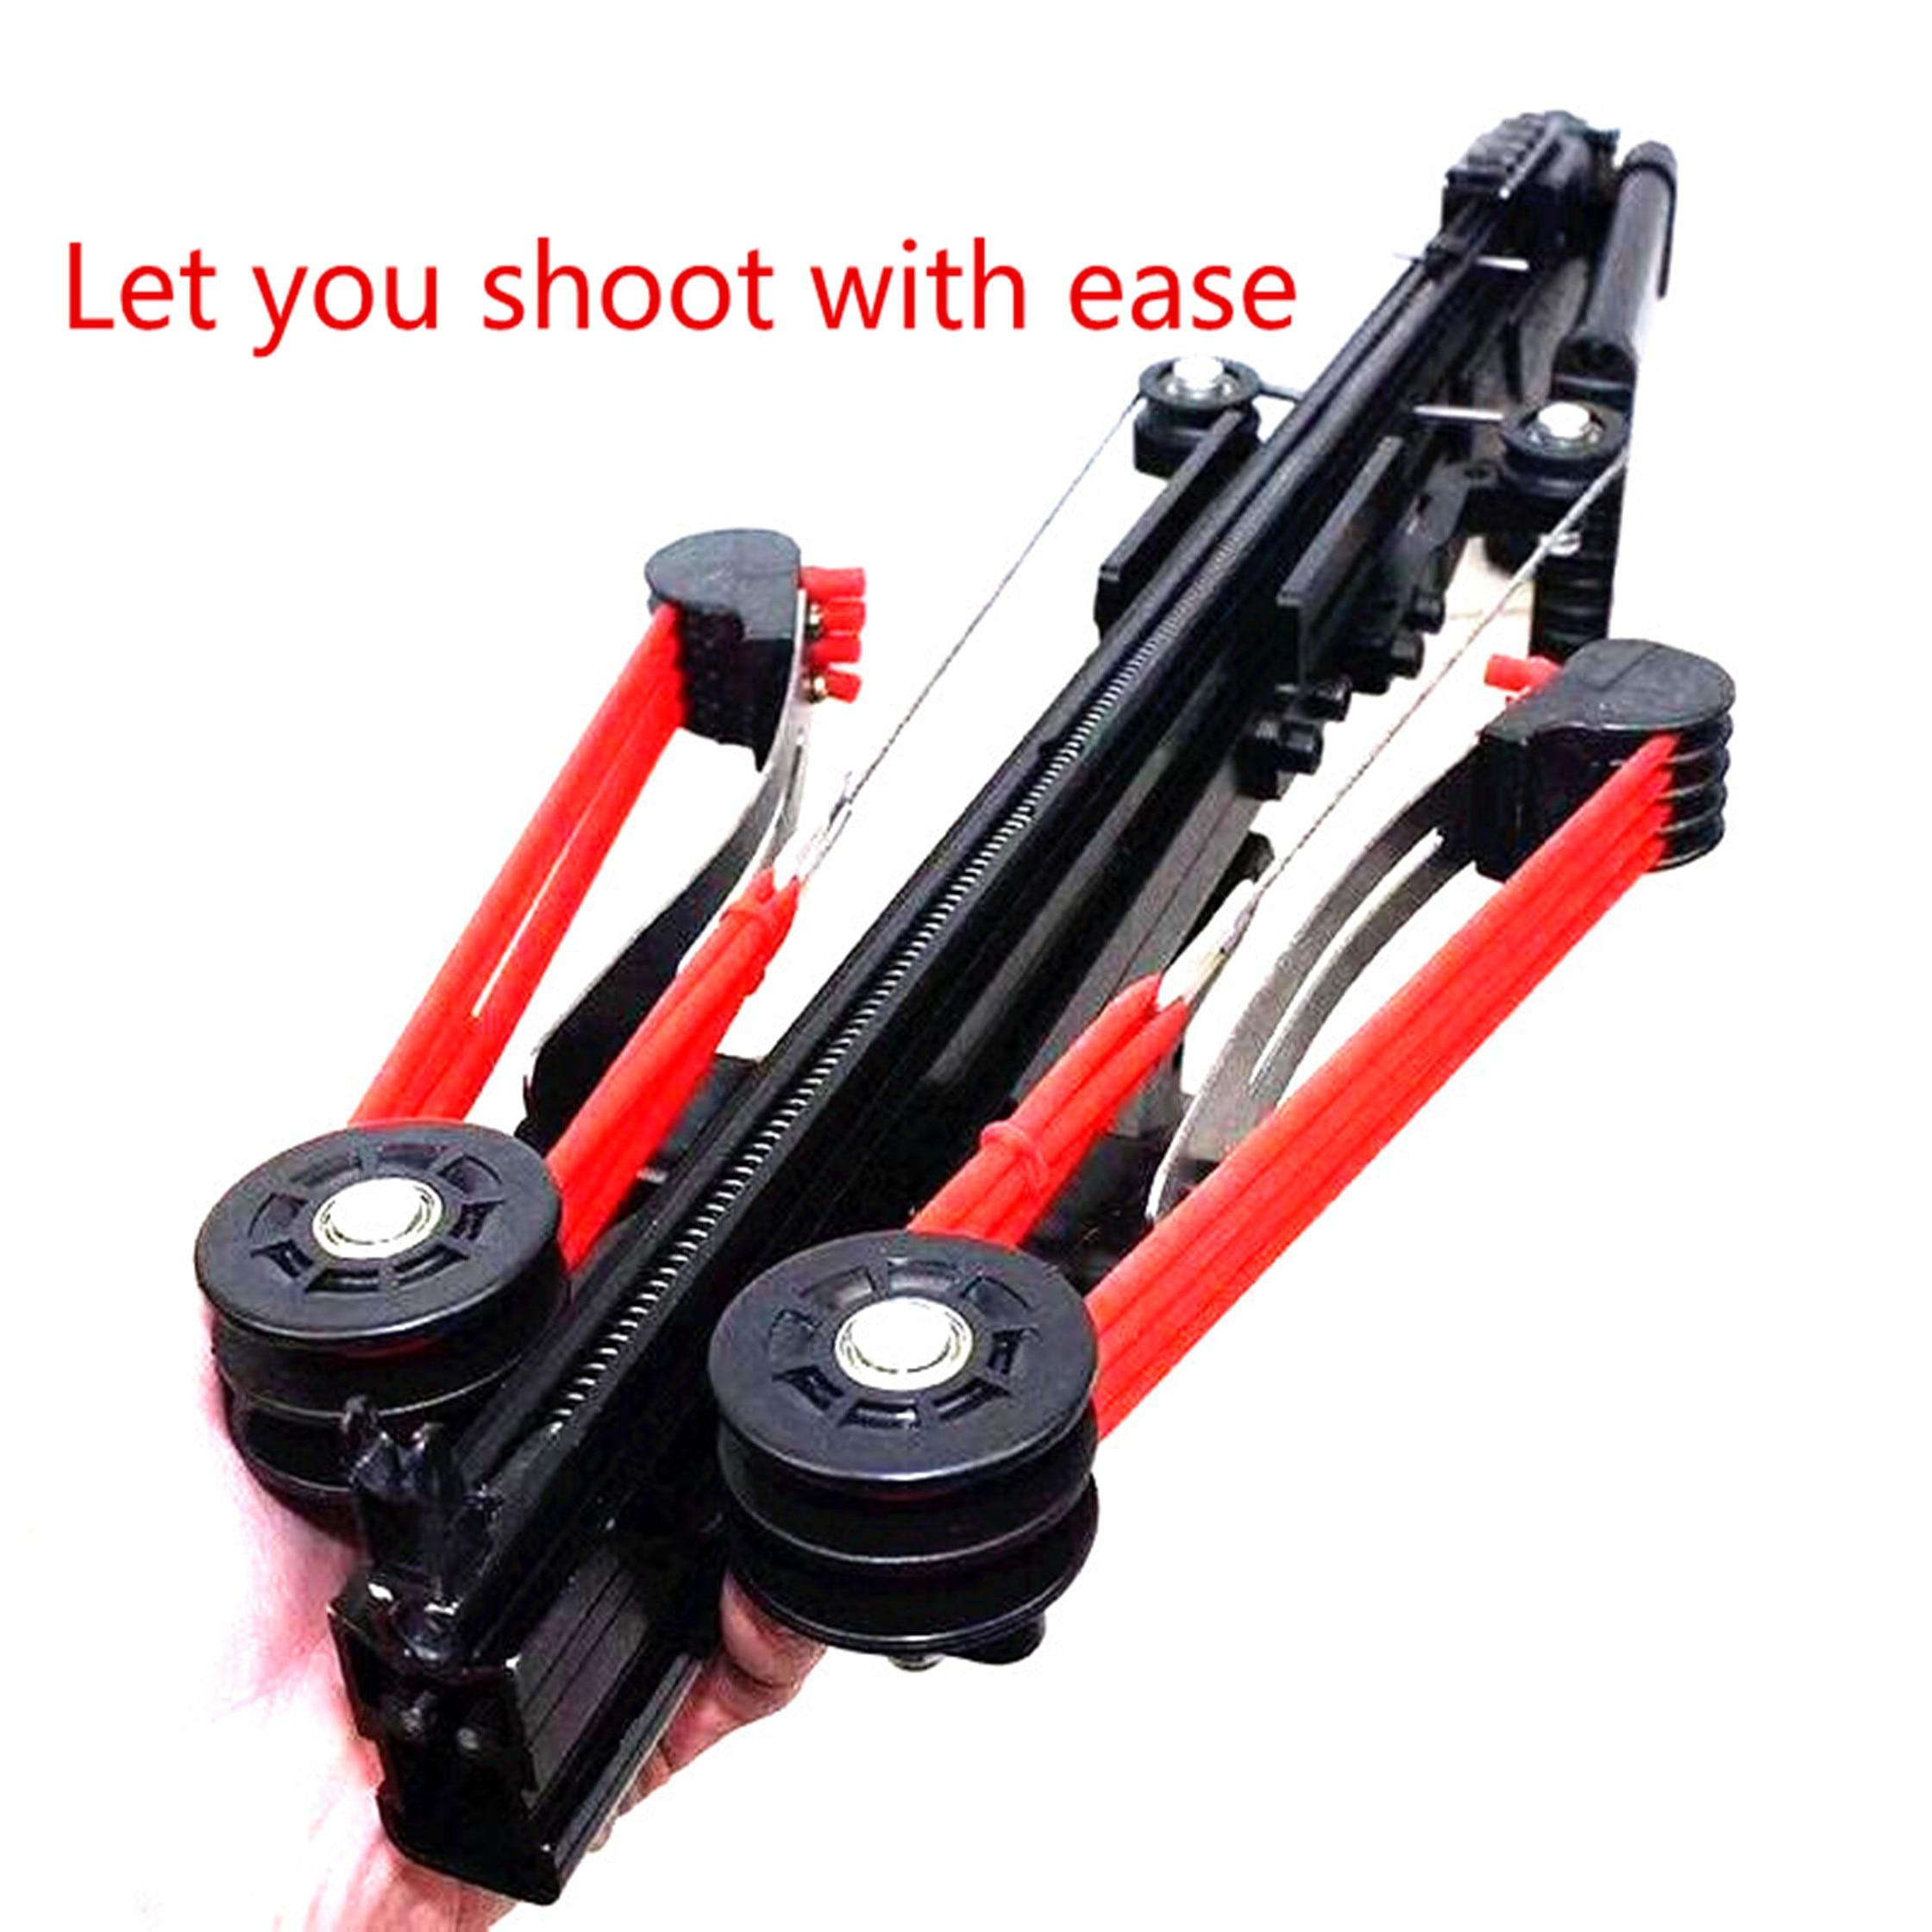 Neptune 11 Slingshot 40BB Shooting Tension Rubber Band Bullets Hunting Slingshot Semi automatic slingshot Continuous shooting